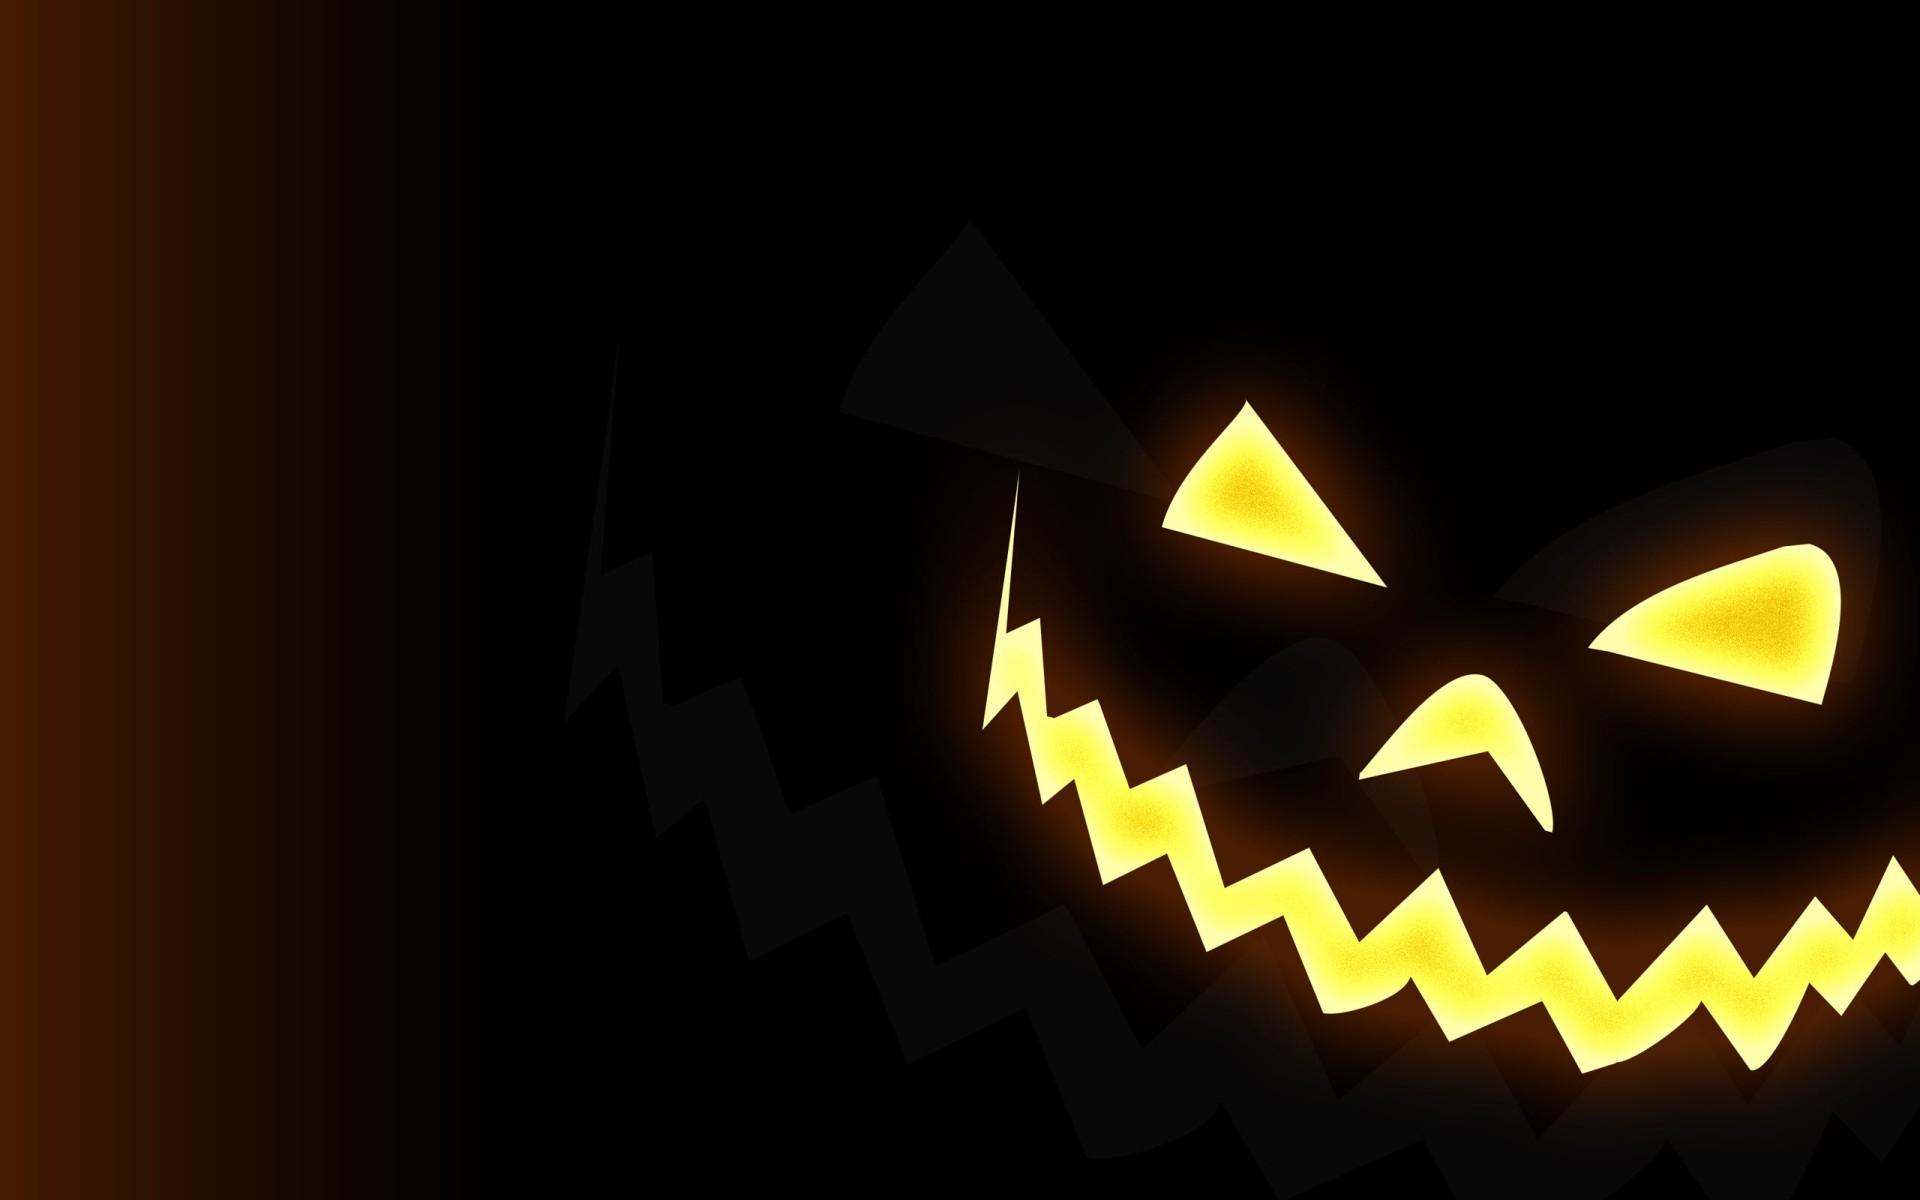 Desktop halloween wallpaper HD backgrounds.